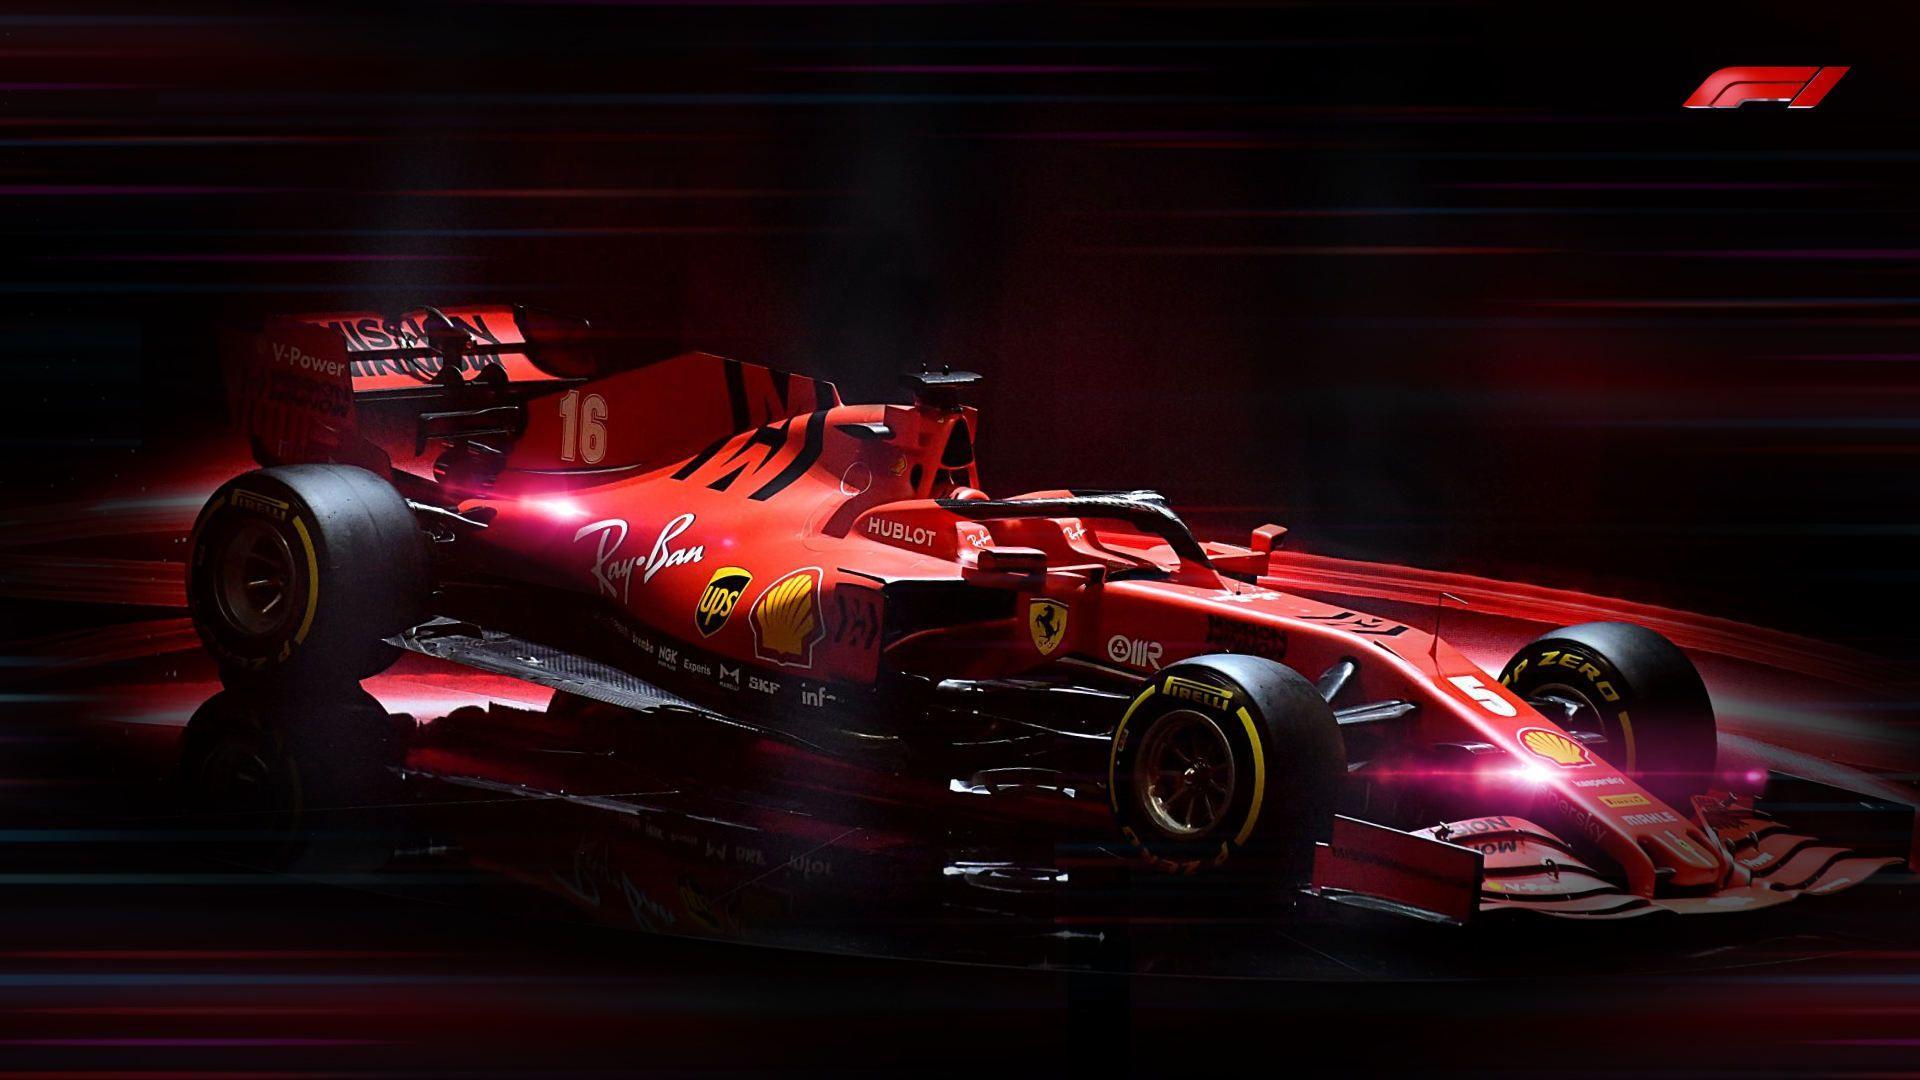 Ferrari Formula 1 Wallpapers - Top Free Ferrari Formula 1 ...